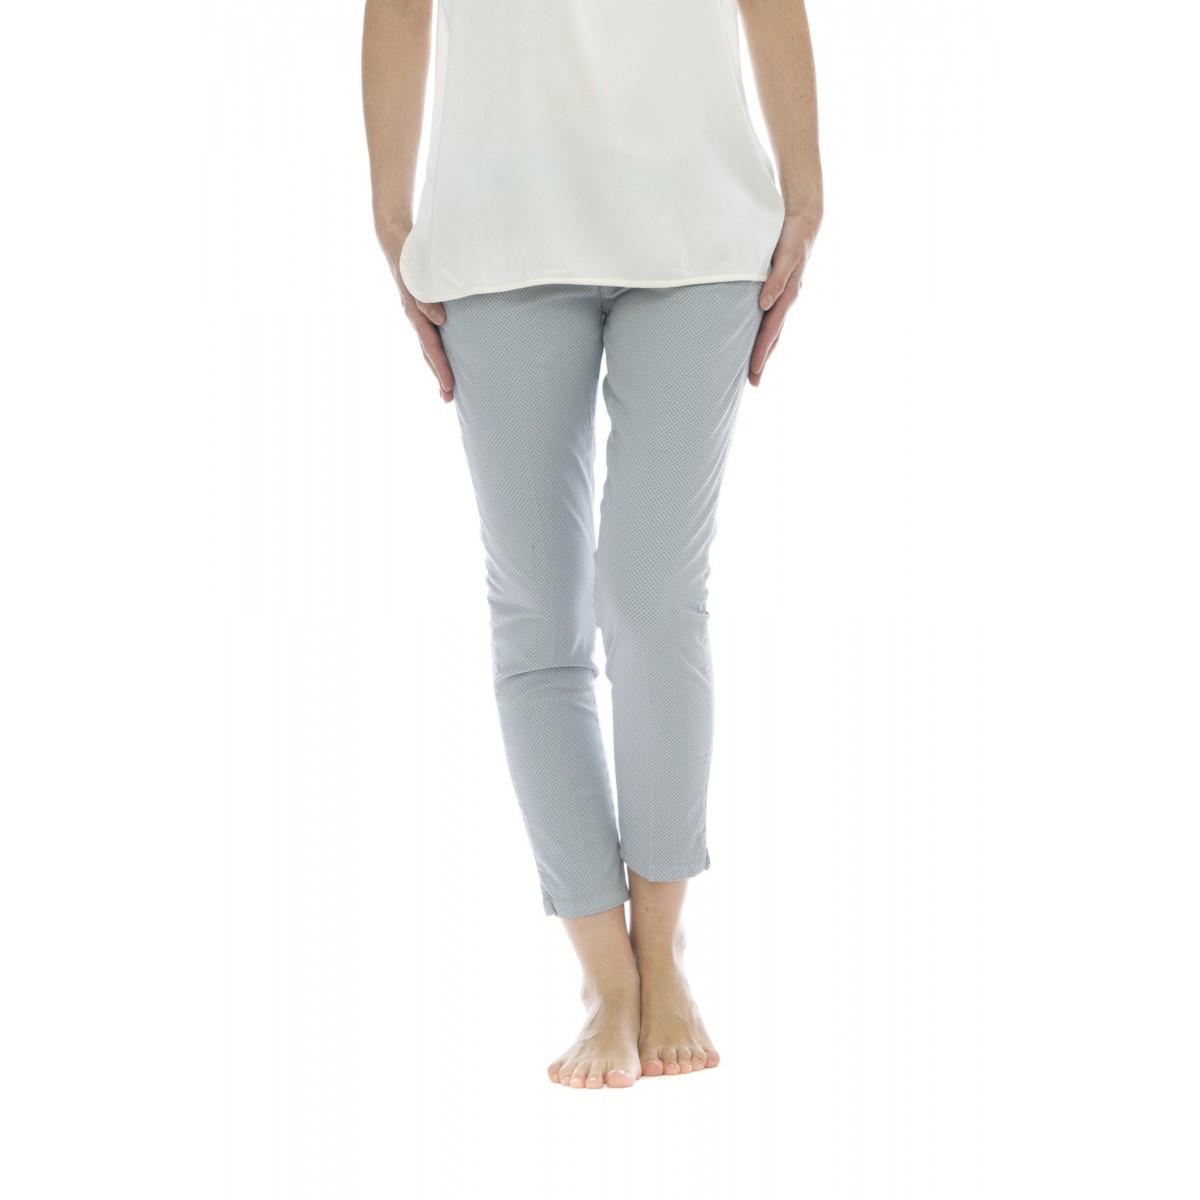 Pantalone donna - Melitas 9646